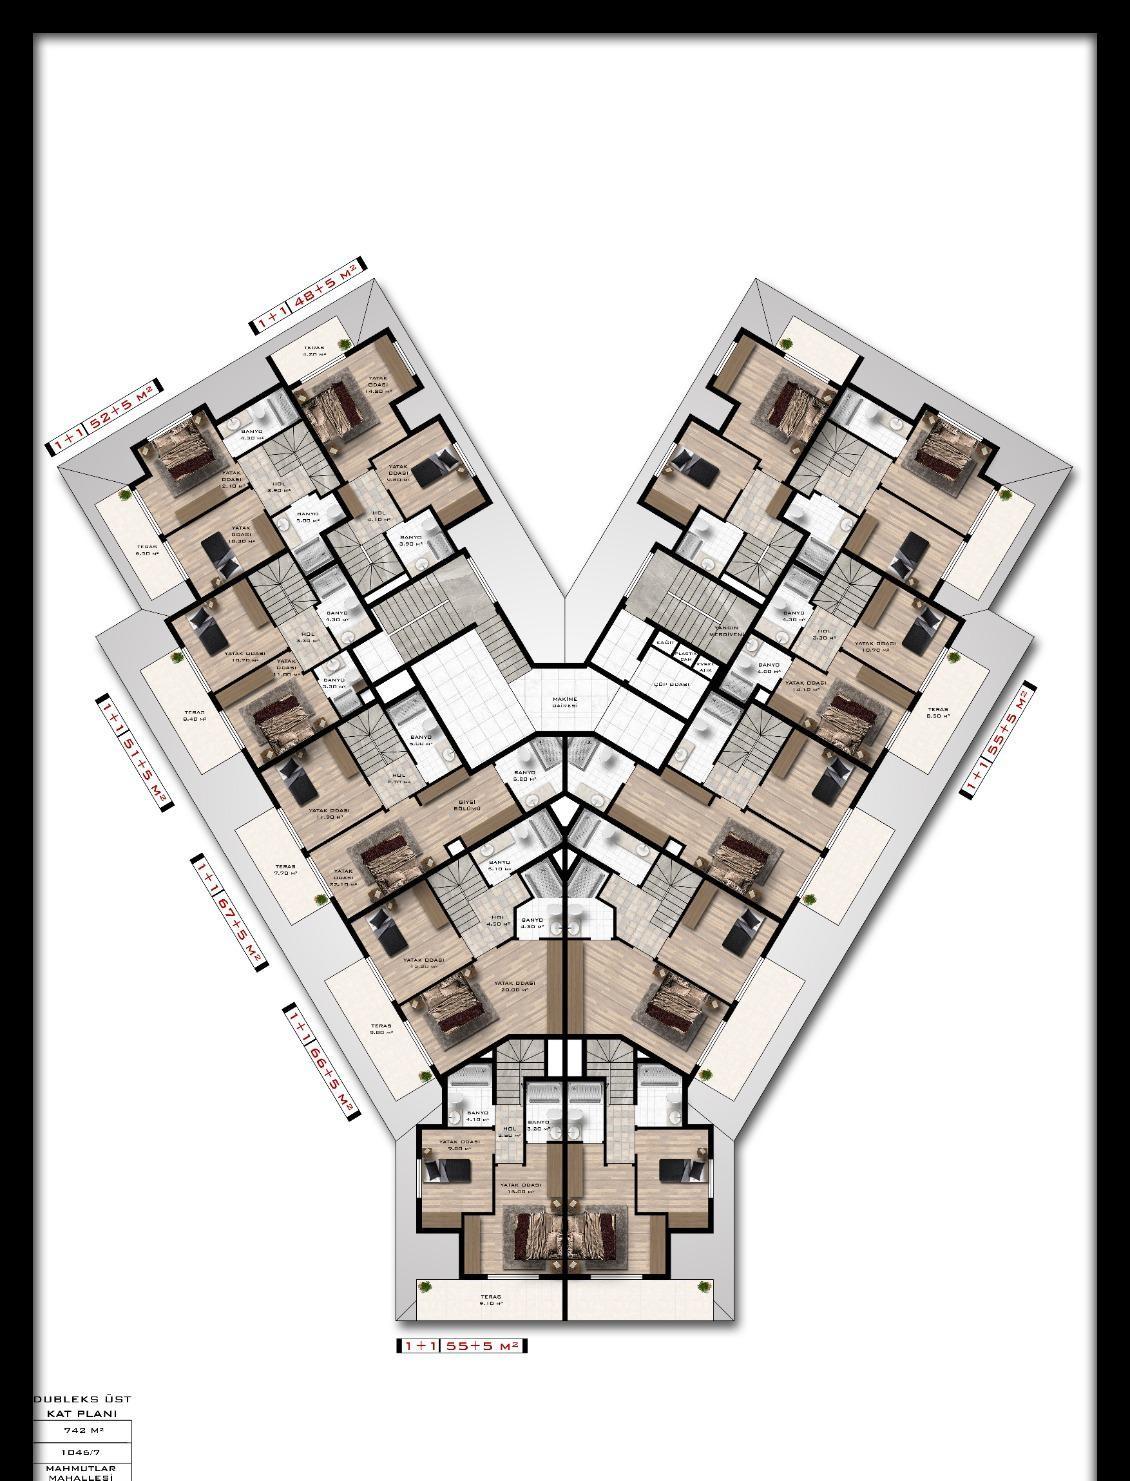 Квартиры и пентхаусы в комплексе с богатой инфраструктурой район Махмутлар - Фото 20